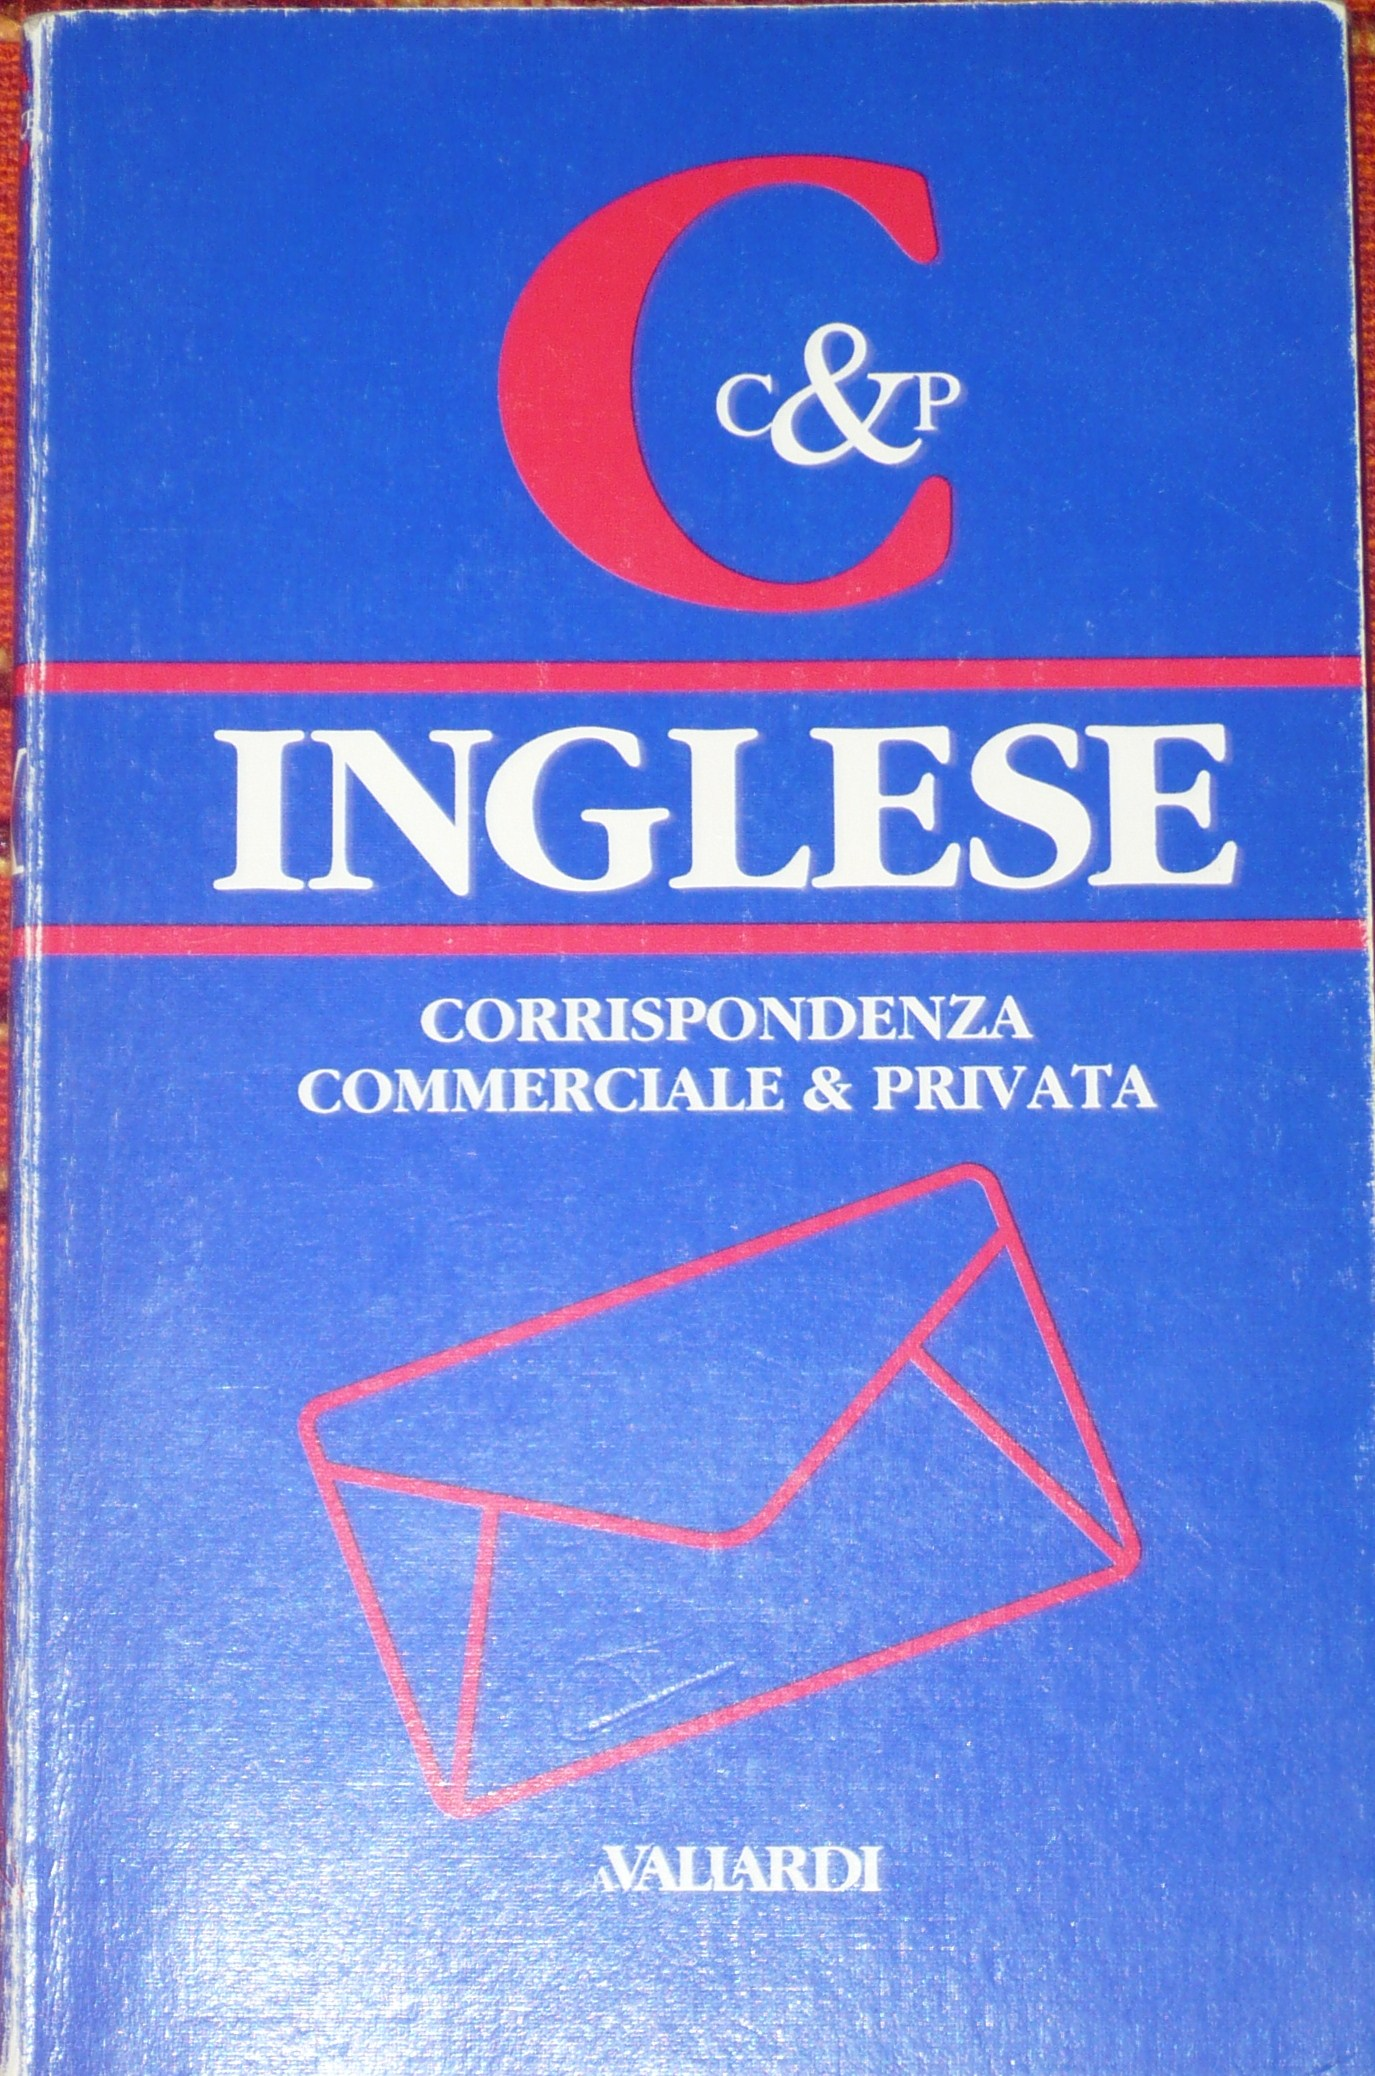 Corrispondenza inglese